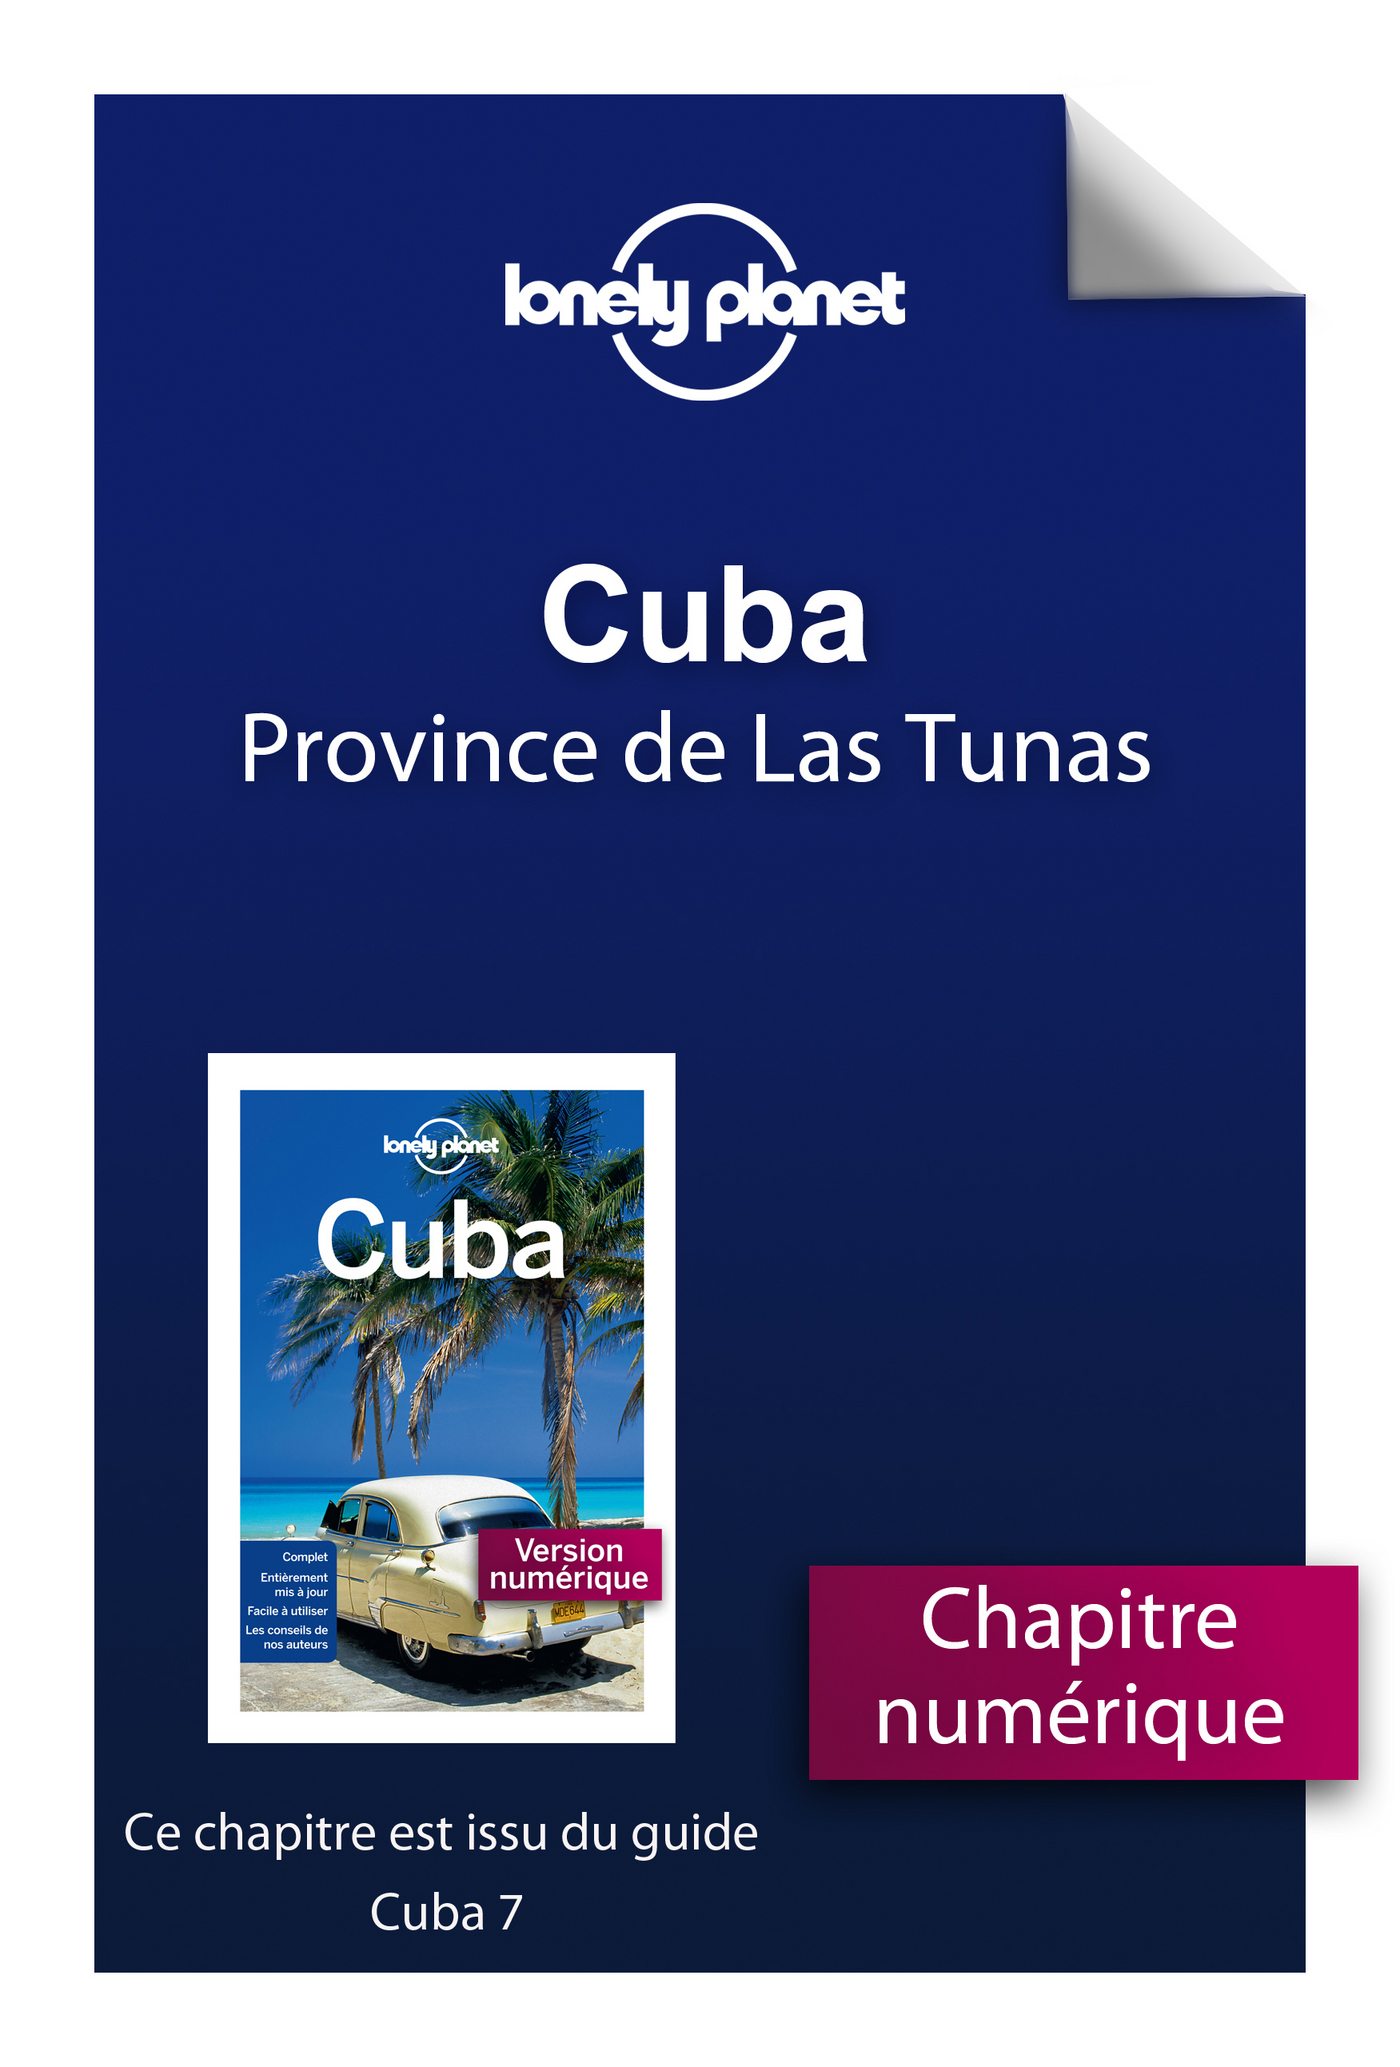 Cuba 7 - Province de Las Tunas